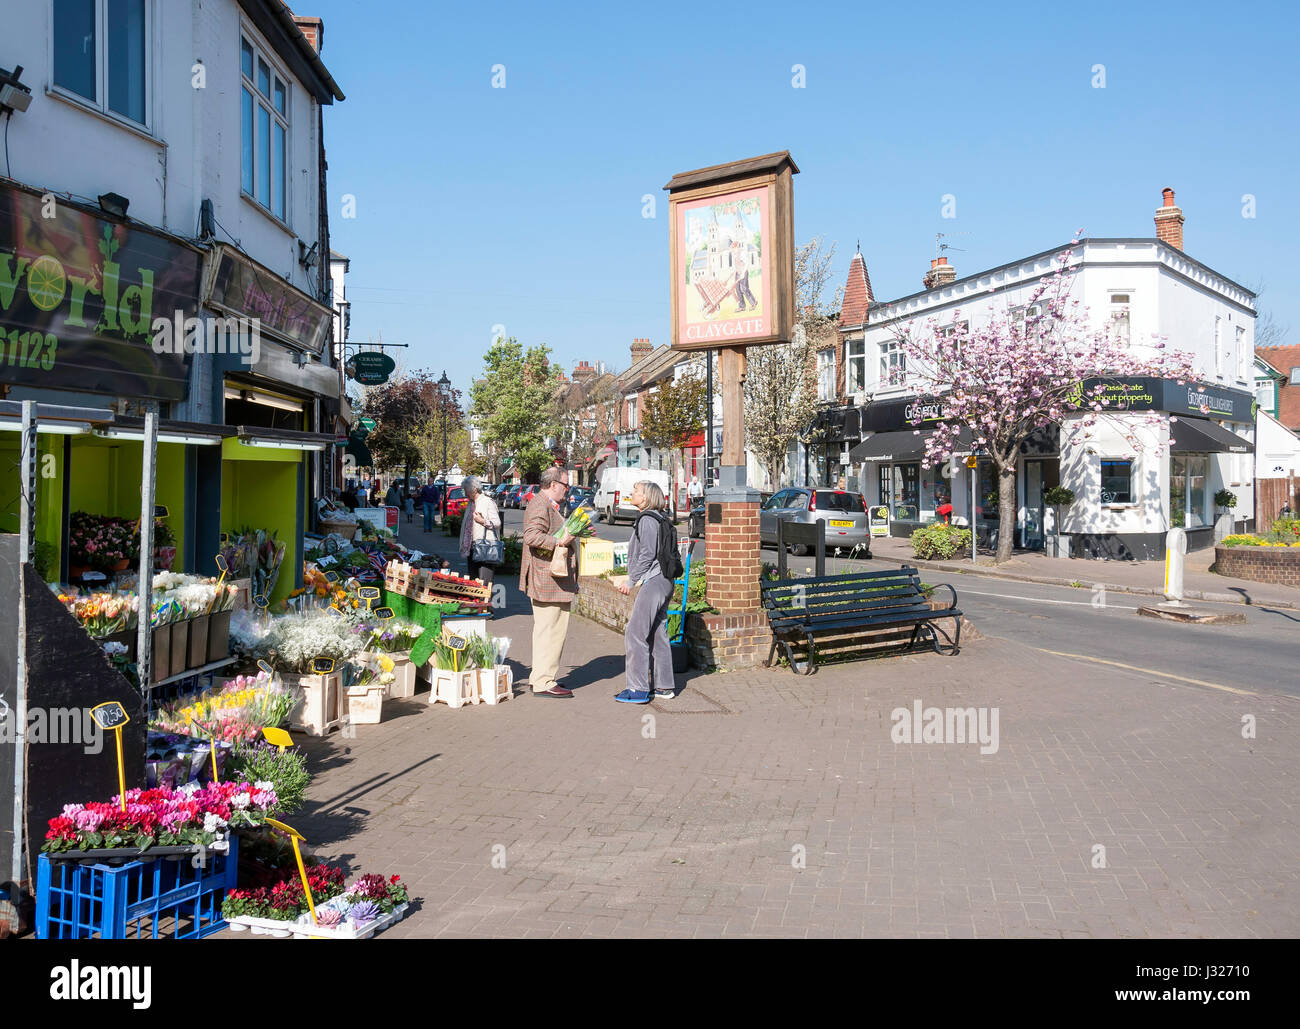 The Parade, Claygate, Surrey, England, United Kingdom - Stock Image